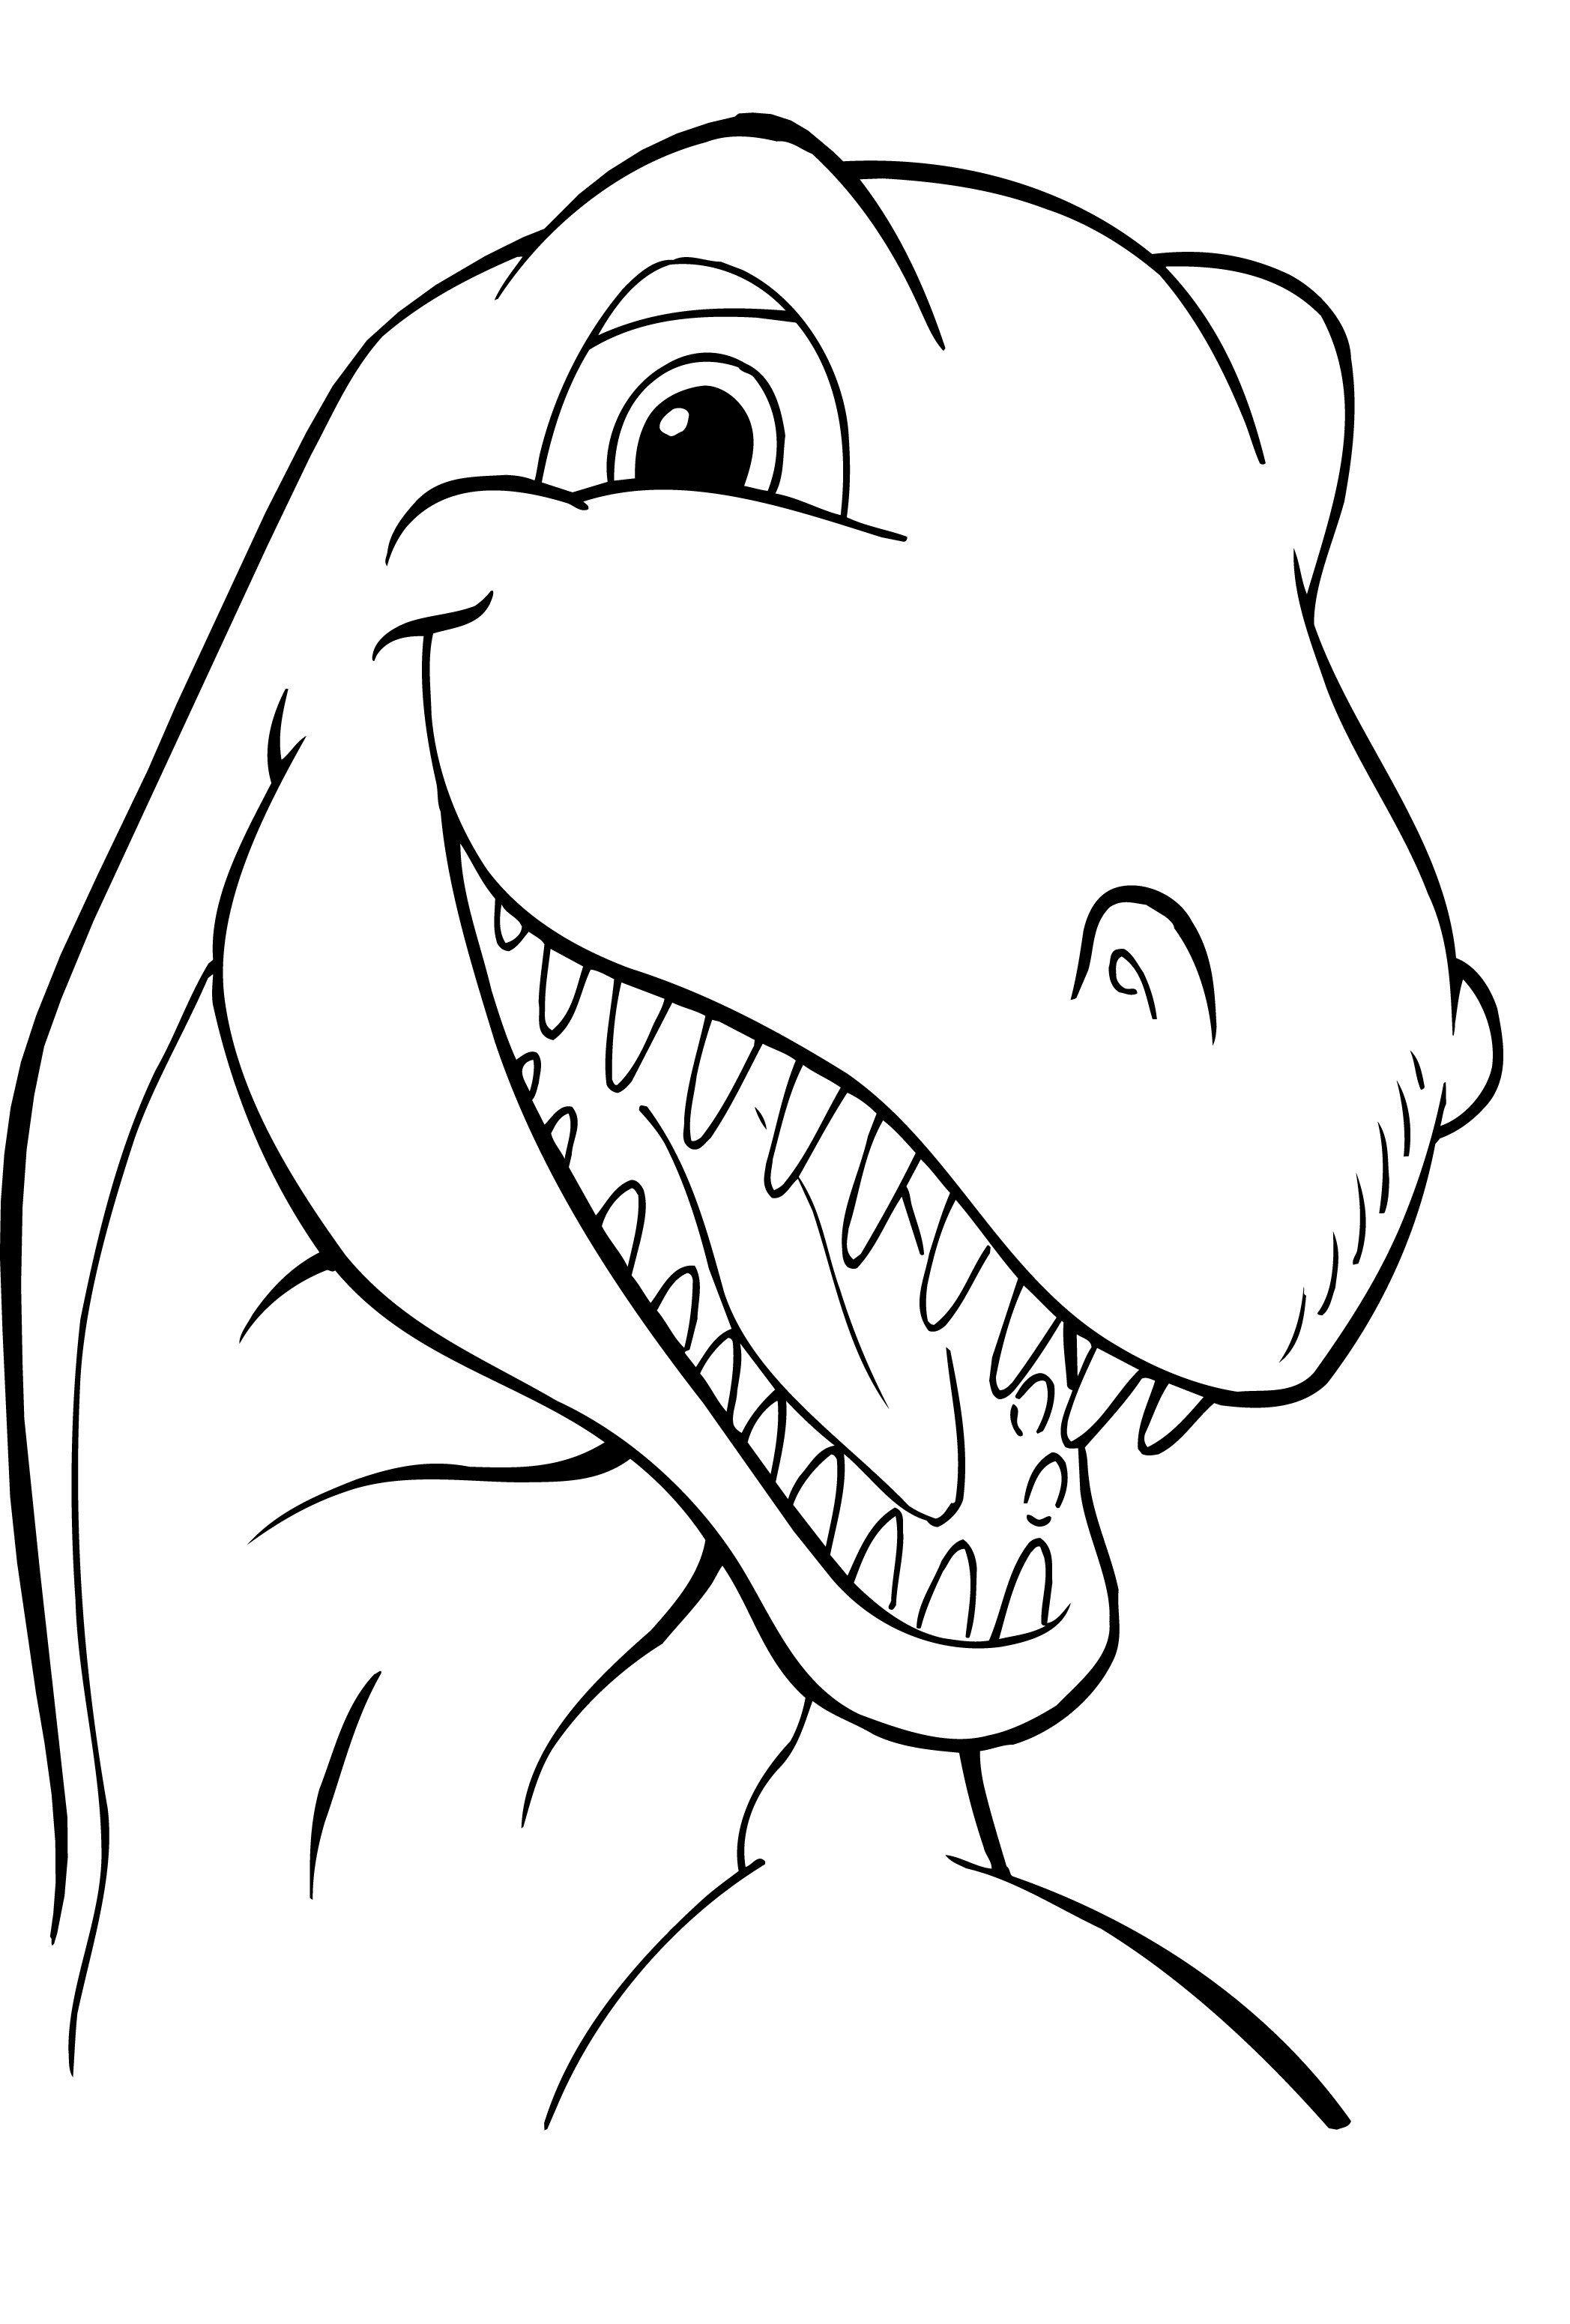 Dinosaur coloring pages free printable dinosaur coloring